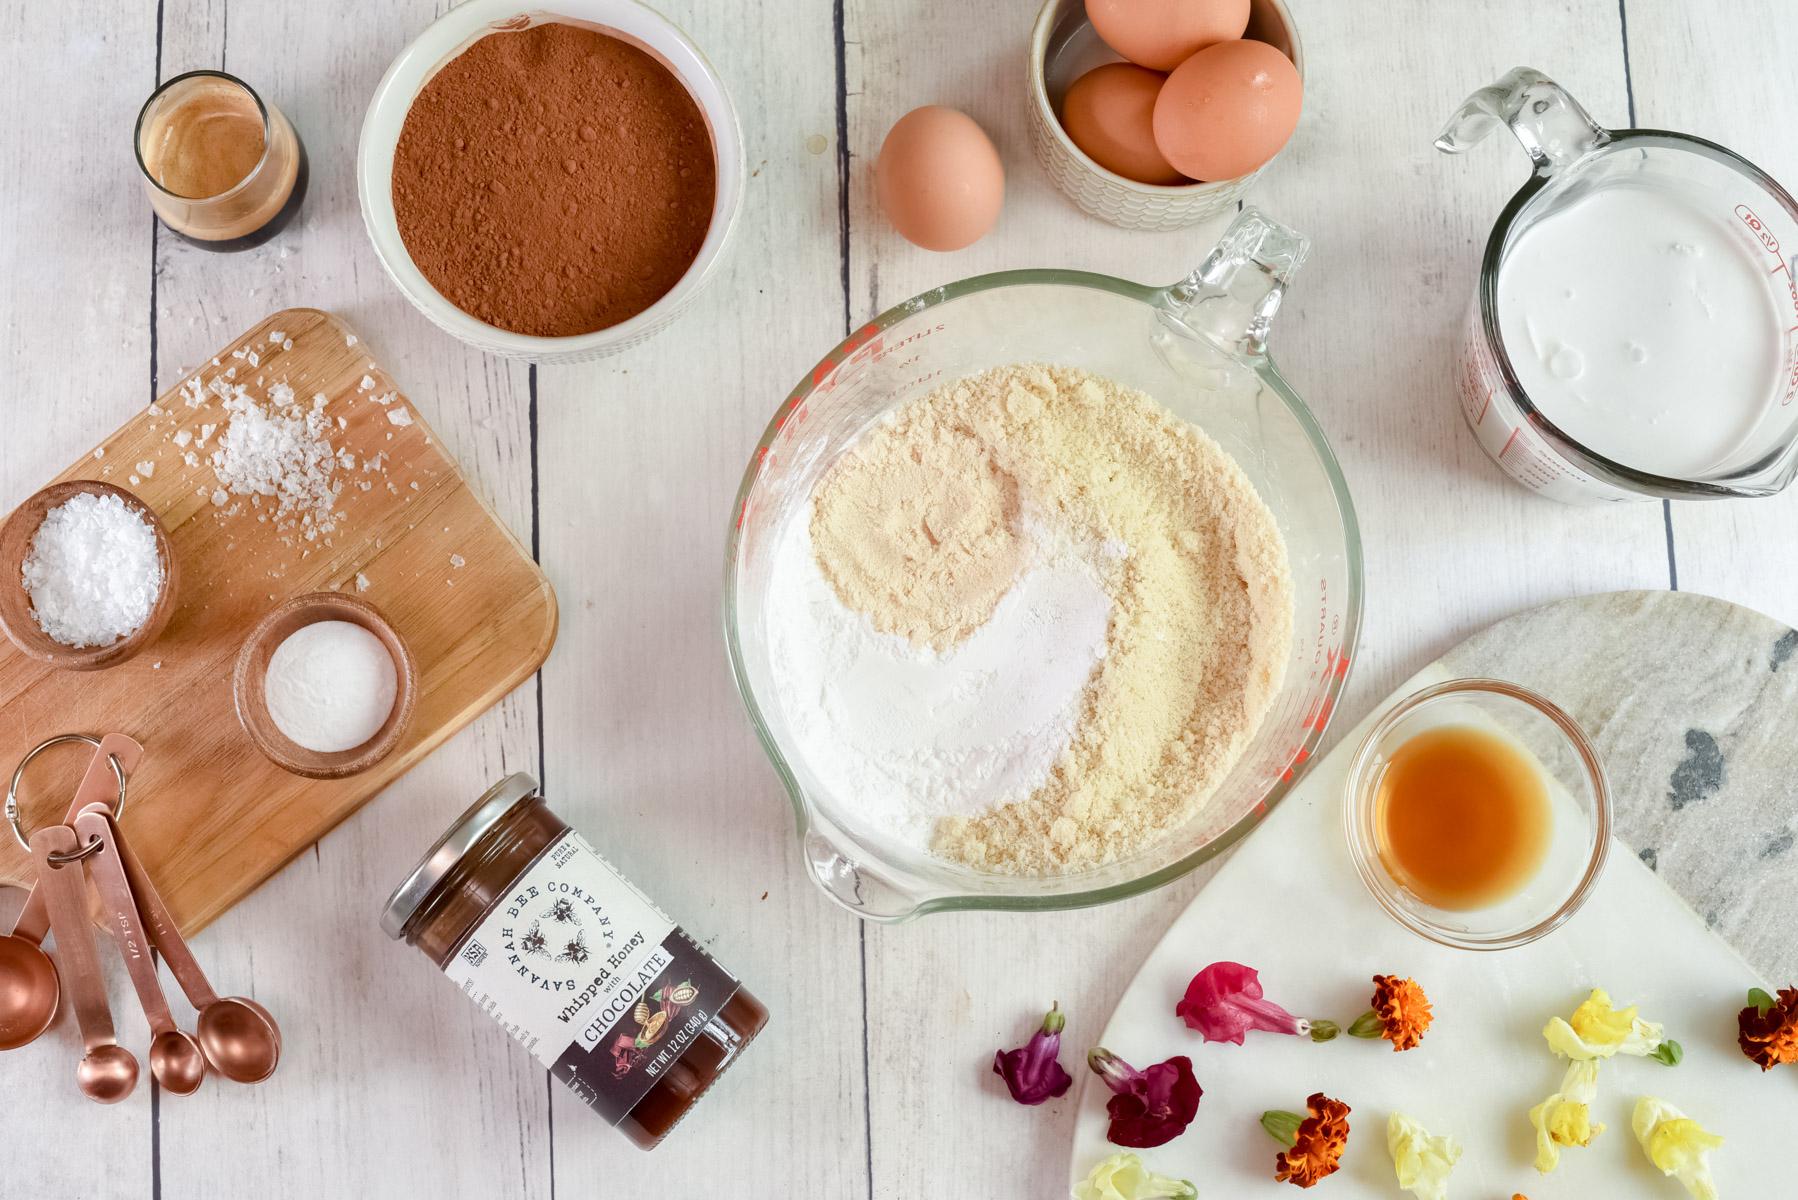 chocolate-whipped-honey-cake-savannah-bee-company.jpg